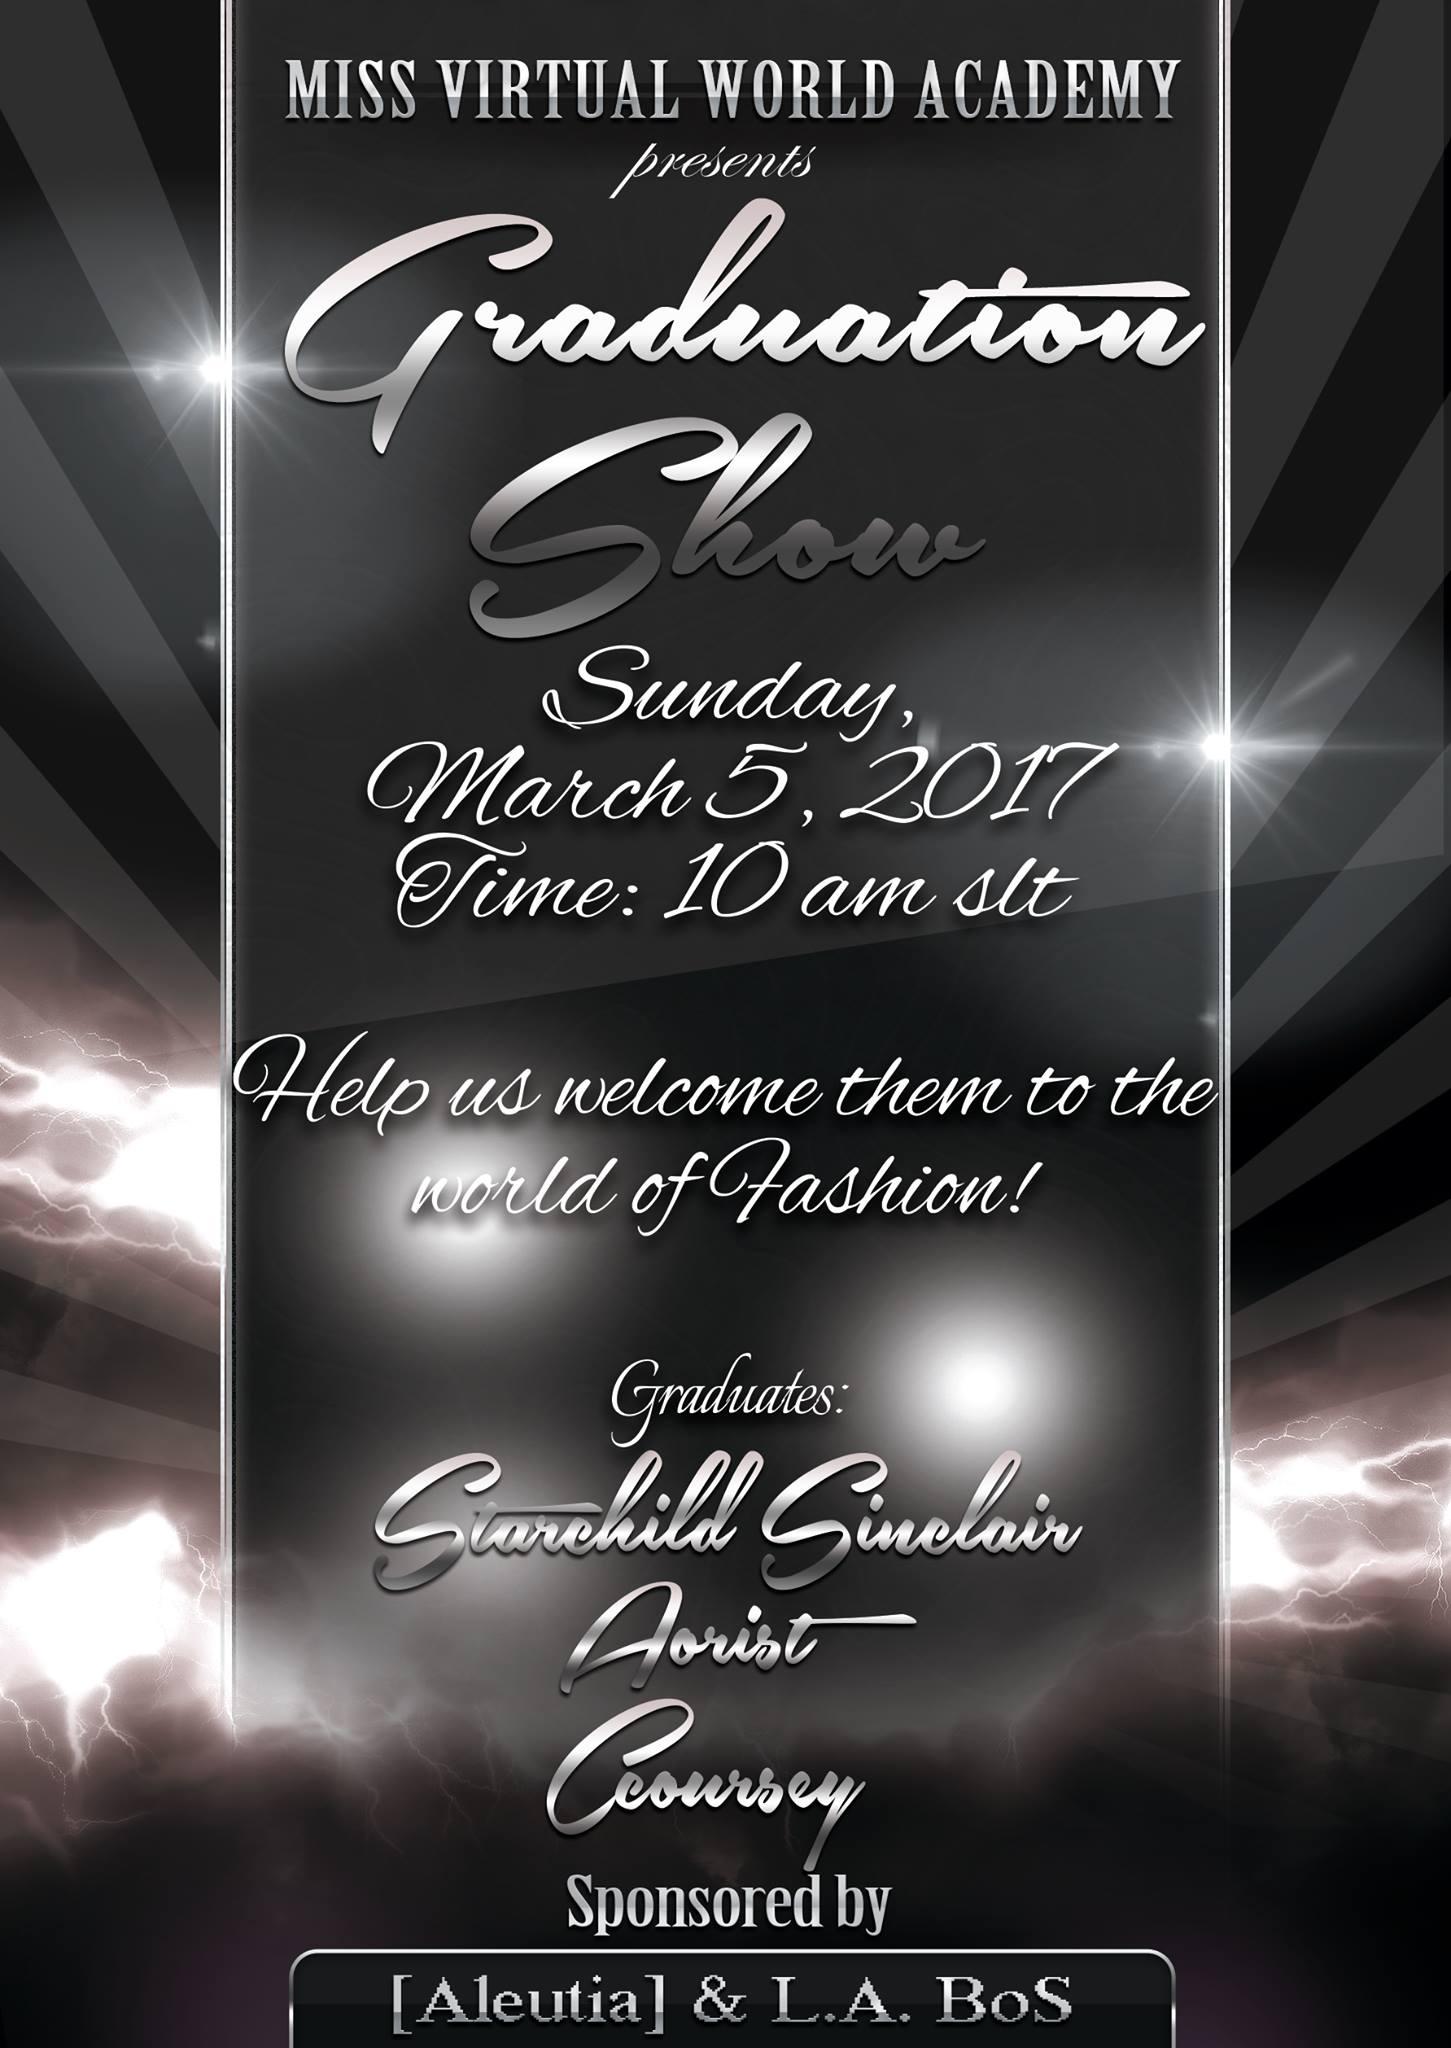 mvwa-graduation